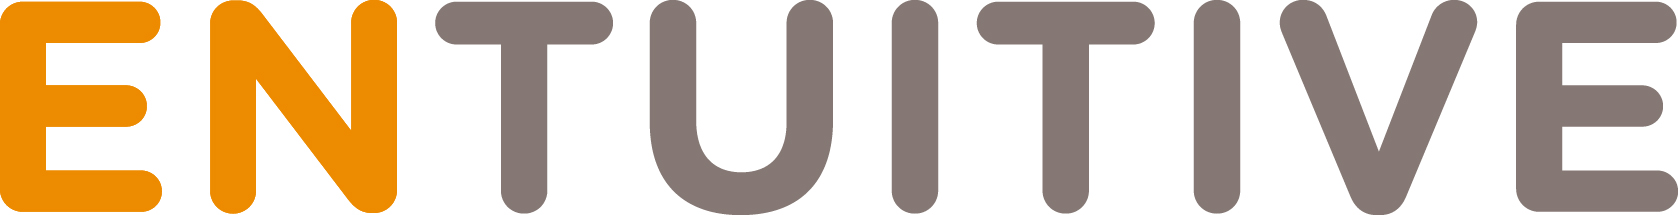 Entuititve Logo